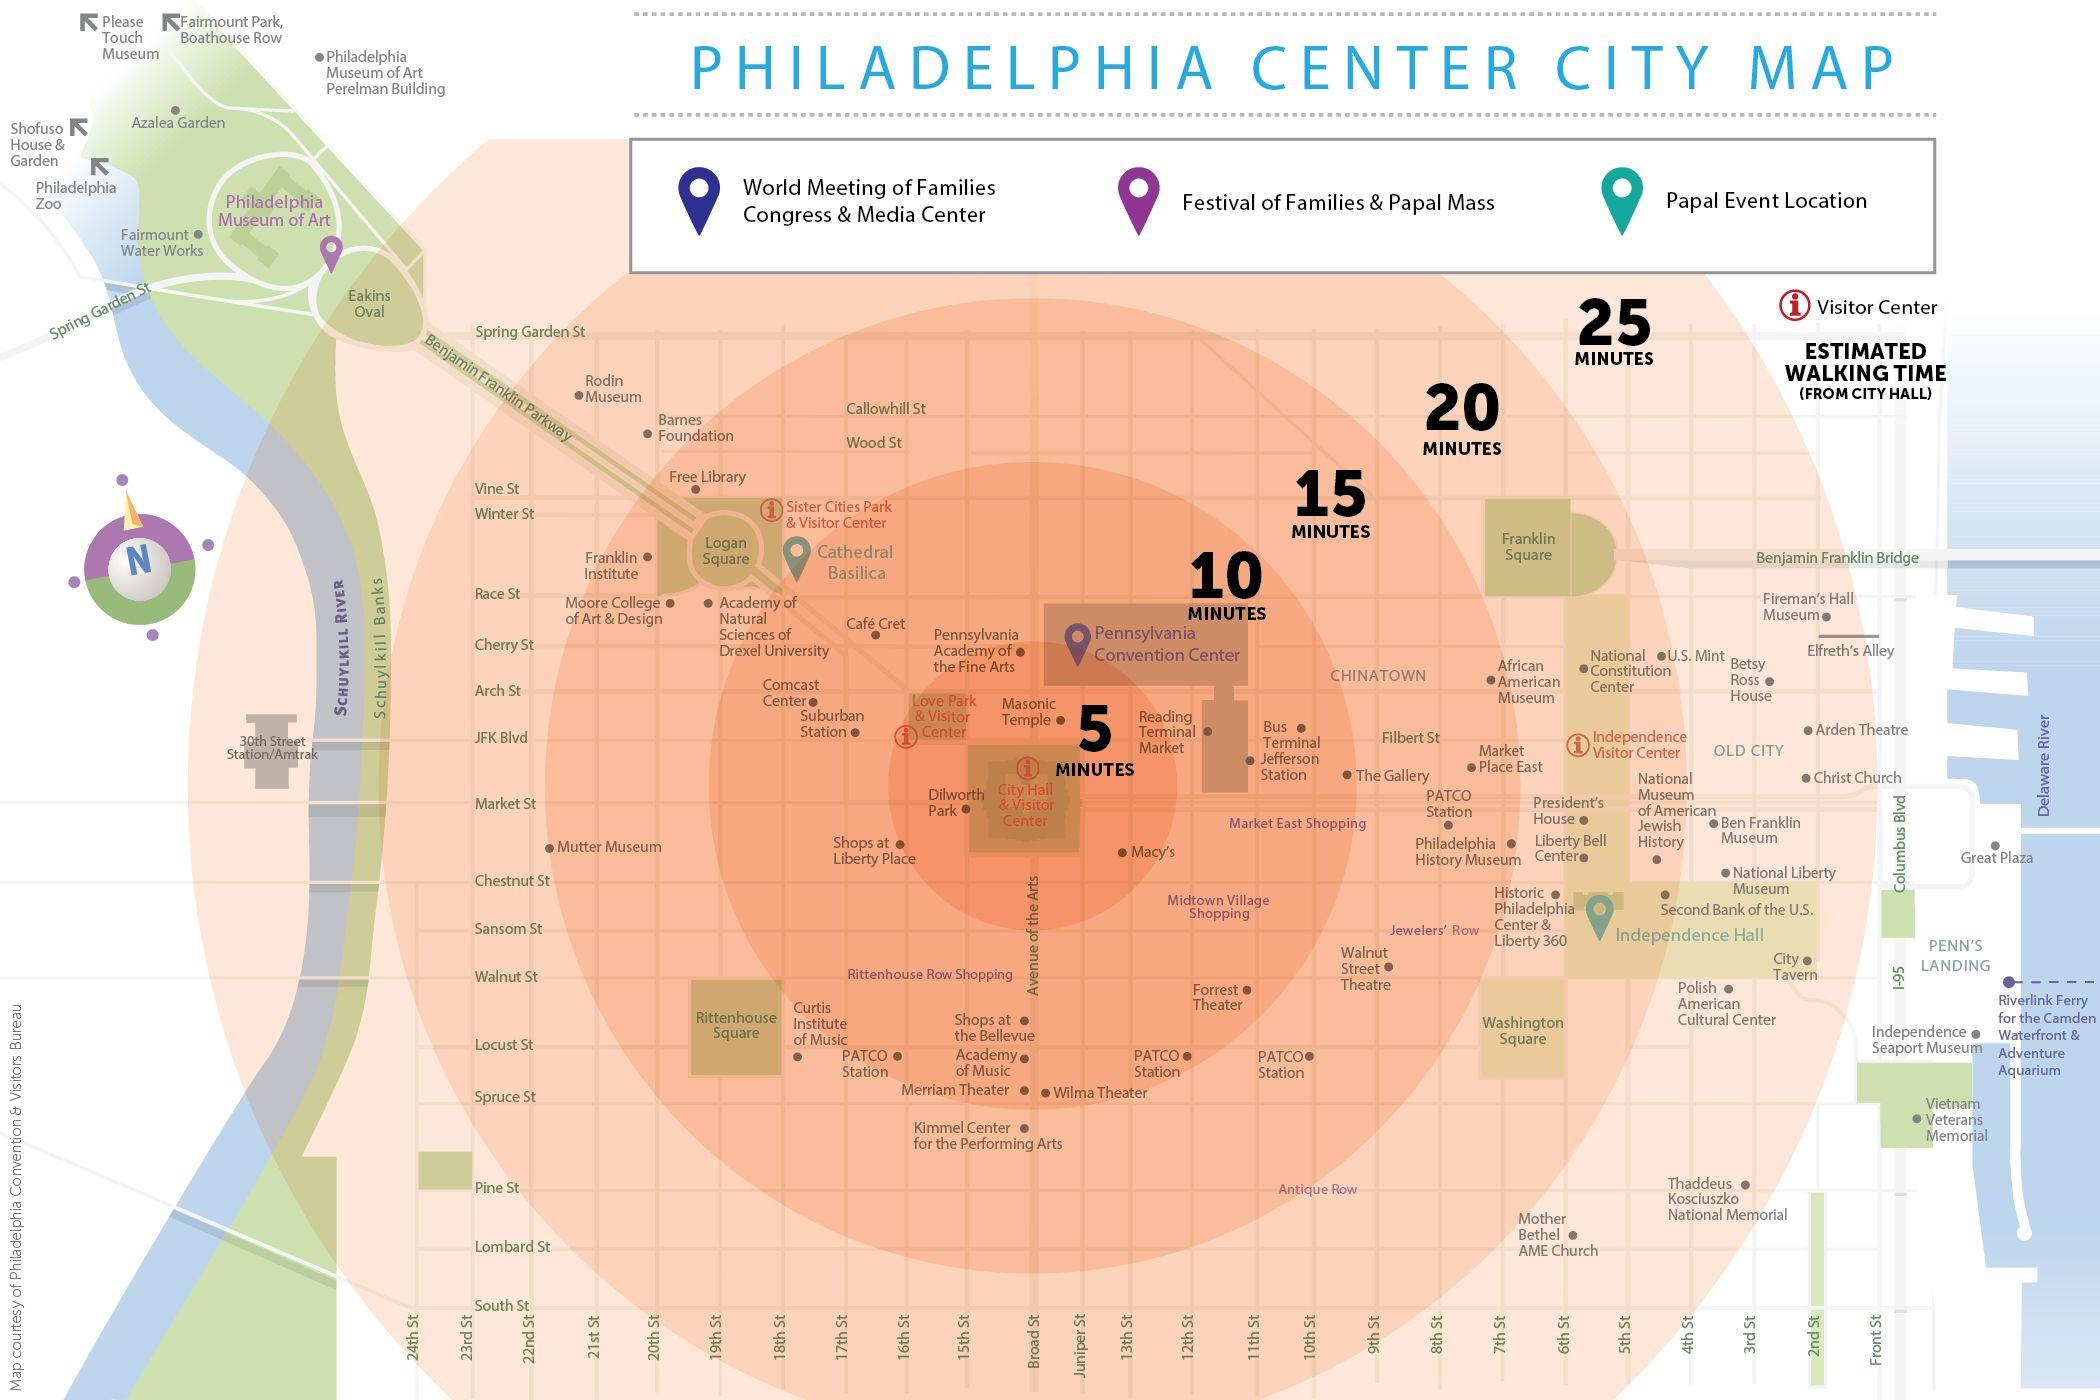 Center City Philadelphia walking map for World Meeting of ... on downtown houston, rittenhouse square, septa regional rail philadelphia map, west philadelphia map, society hill, eastwick philadelphia map, northwest philadelphia, north philadelphia, philadelphia museum of art, center city utah map, south philadelphia, market street philadelphia map, old city, center city pennsylvania map, franklin institute philadelphia map, spring garden, downtown philadelphia map, penn's landing philadelphia map, wells fargo center, elfreth's alley philadelphia map, naval square philadelphia map, bella vista, philadelphia tourist attractions map, west philadelphia, center city street map, philadelphia city hall, philadelphia delaware river map, dangerous areas of philadelphia map, southwest philadelphia, center city liberty place, center las vegas strip map, market street, bucks county philadelphia map, center city las vegas map, northeast philadelphia, bridesburg philadelphia map, philadelphia international airport,